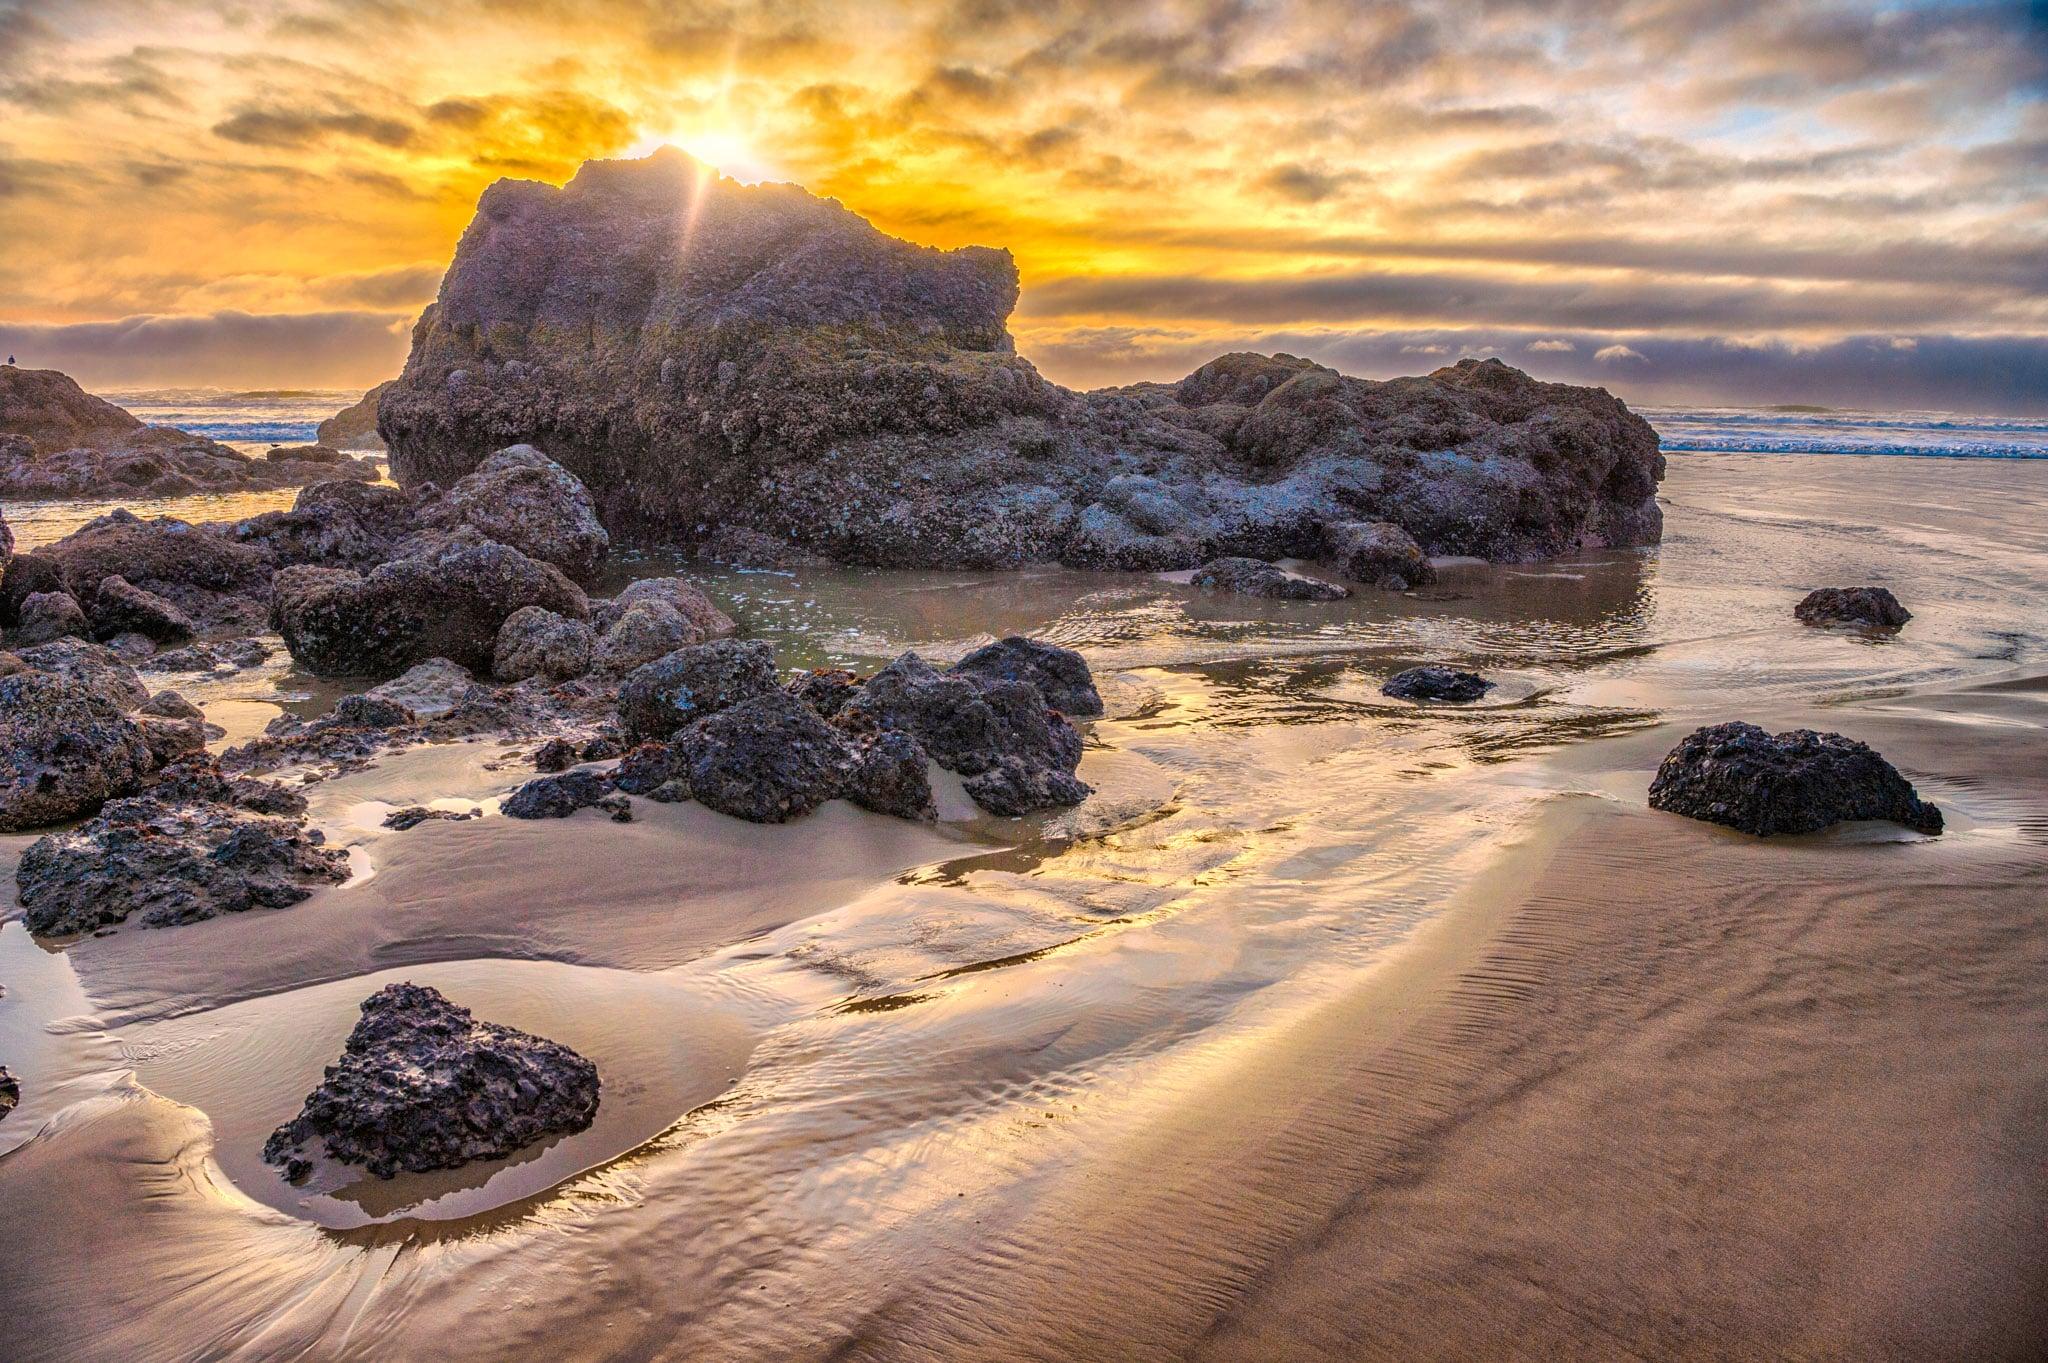 Cannon Beach Sunset - Oregon's Pacific coast